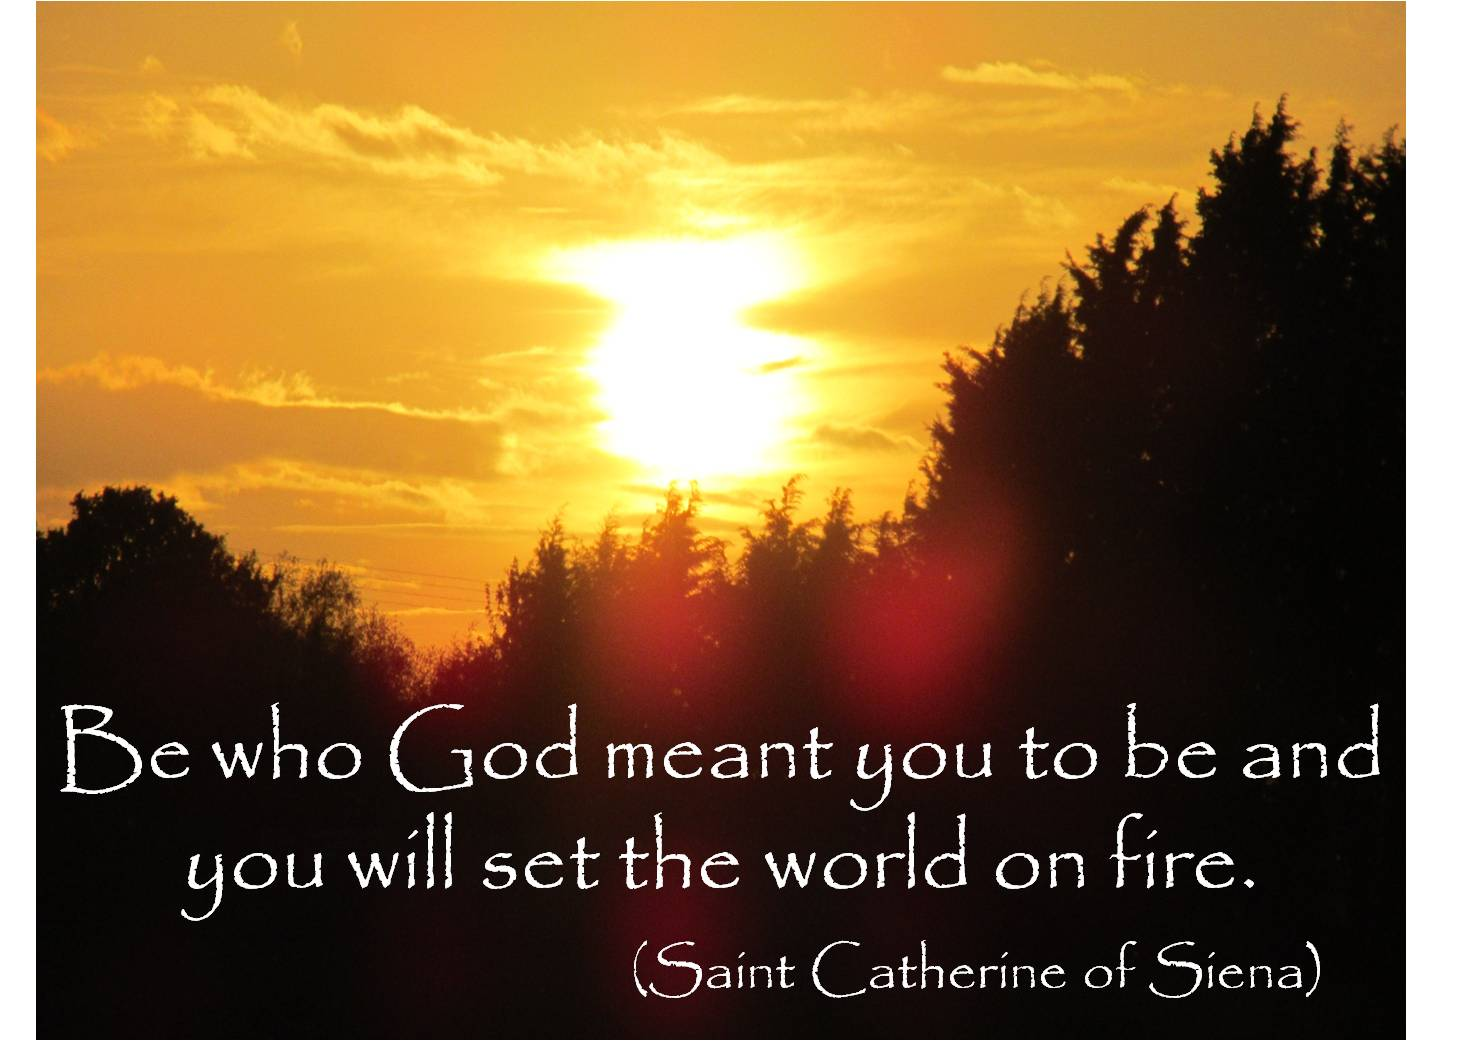 saint-catherine-of-sienna-quote1.jpg